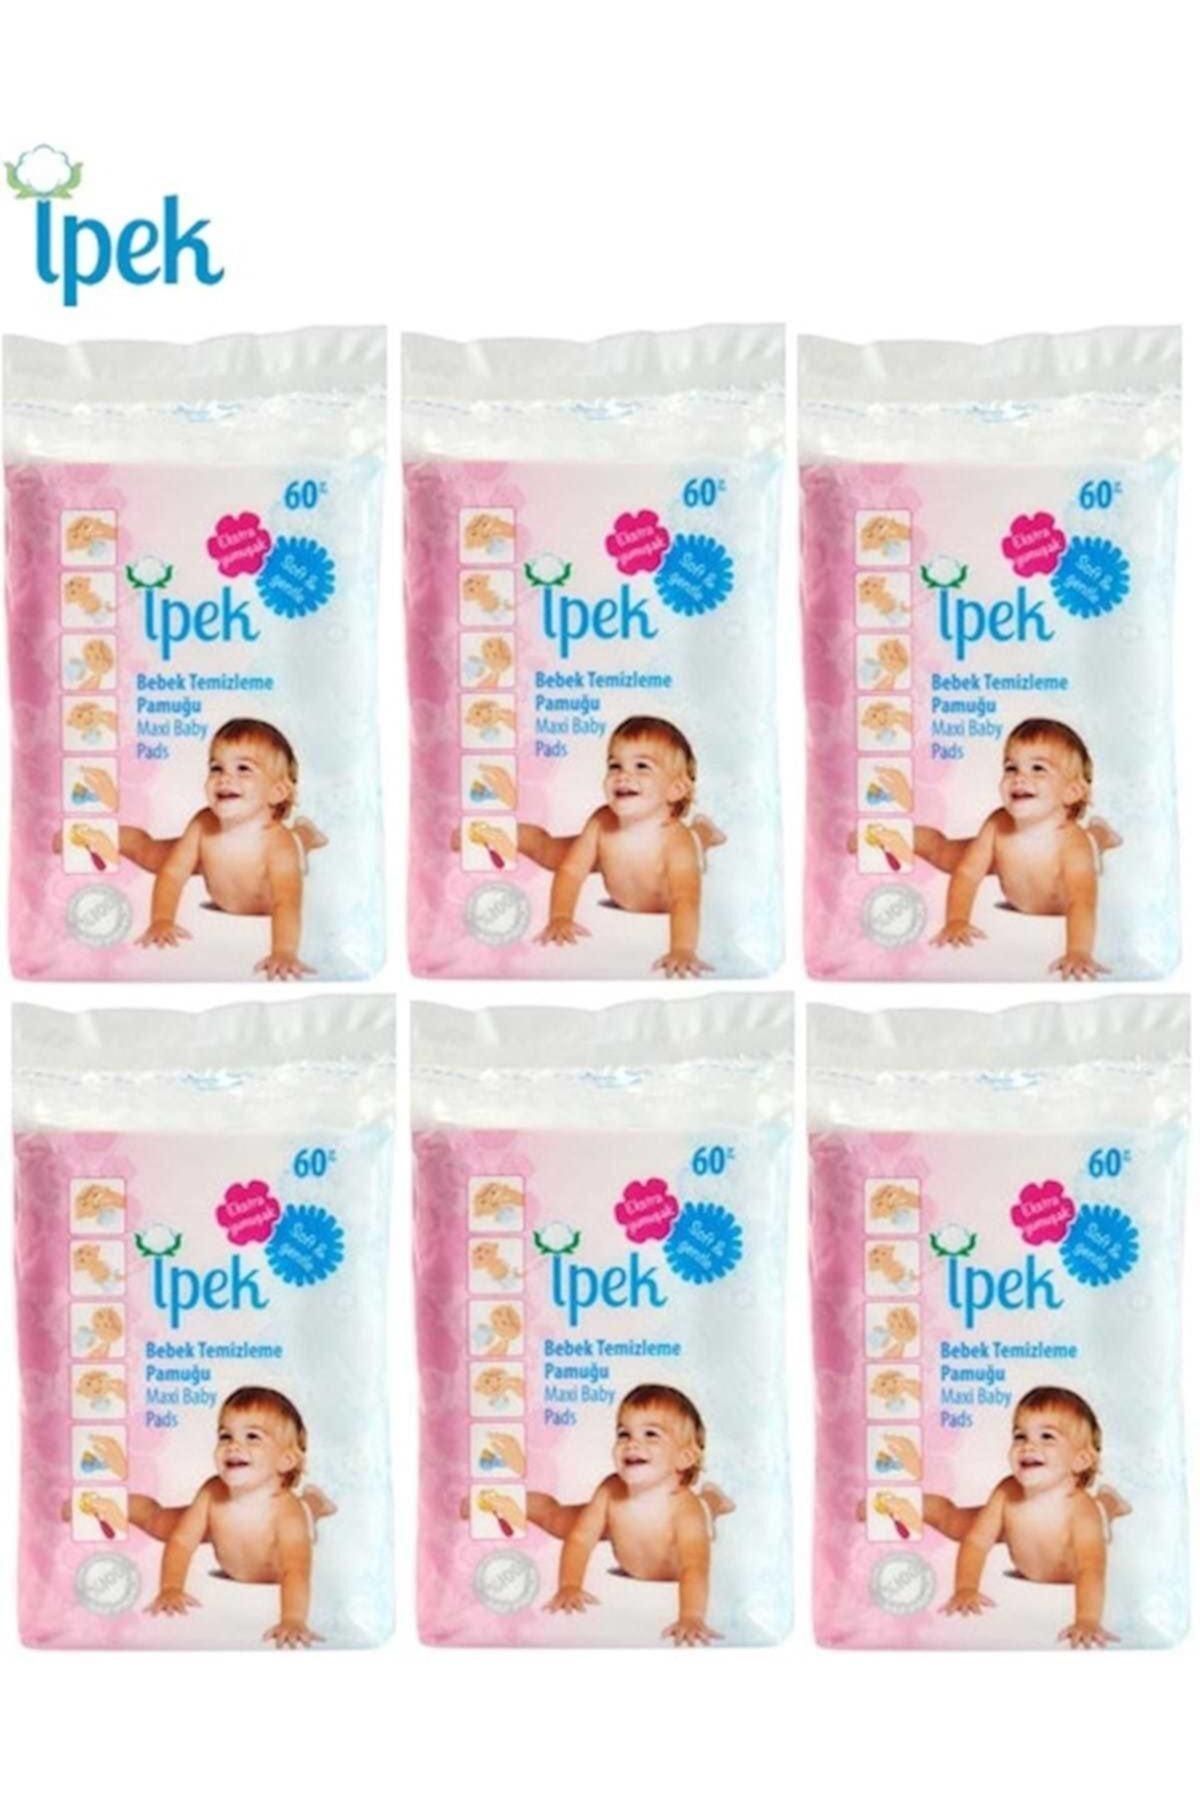 İpek Bebek Temizleme Pamuğu 360 Adet (6pk*60) 1